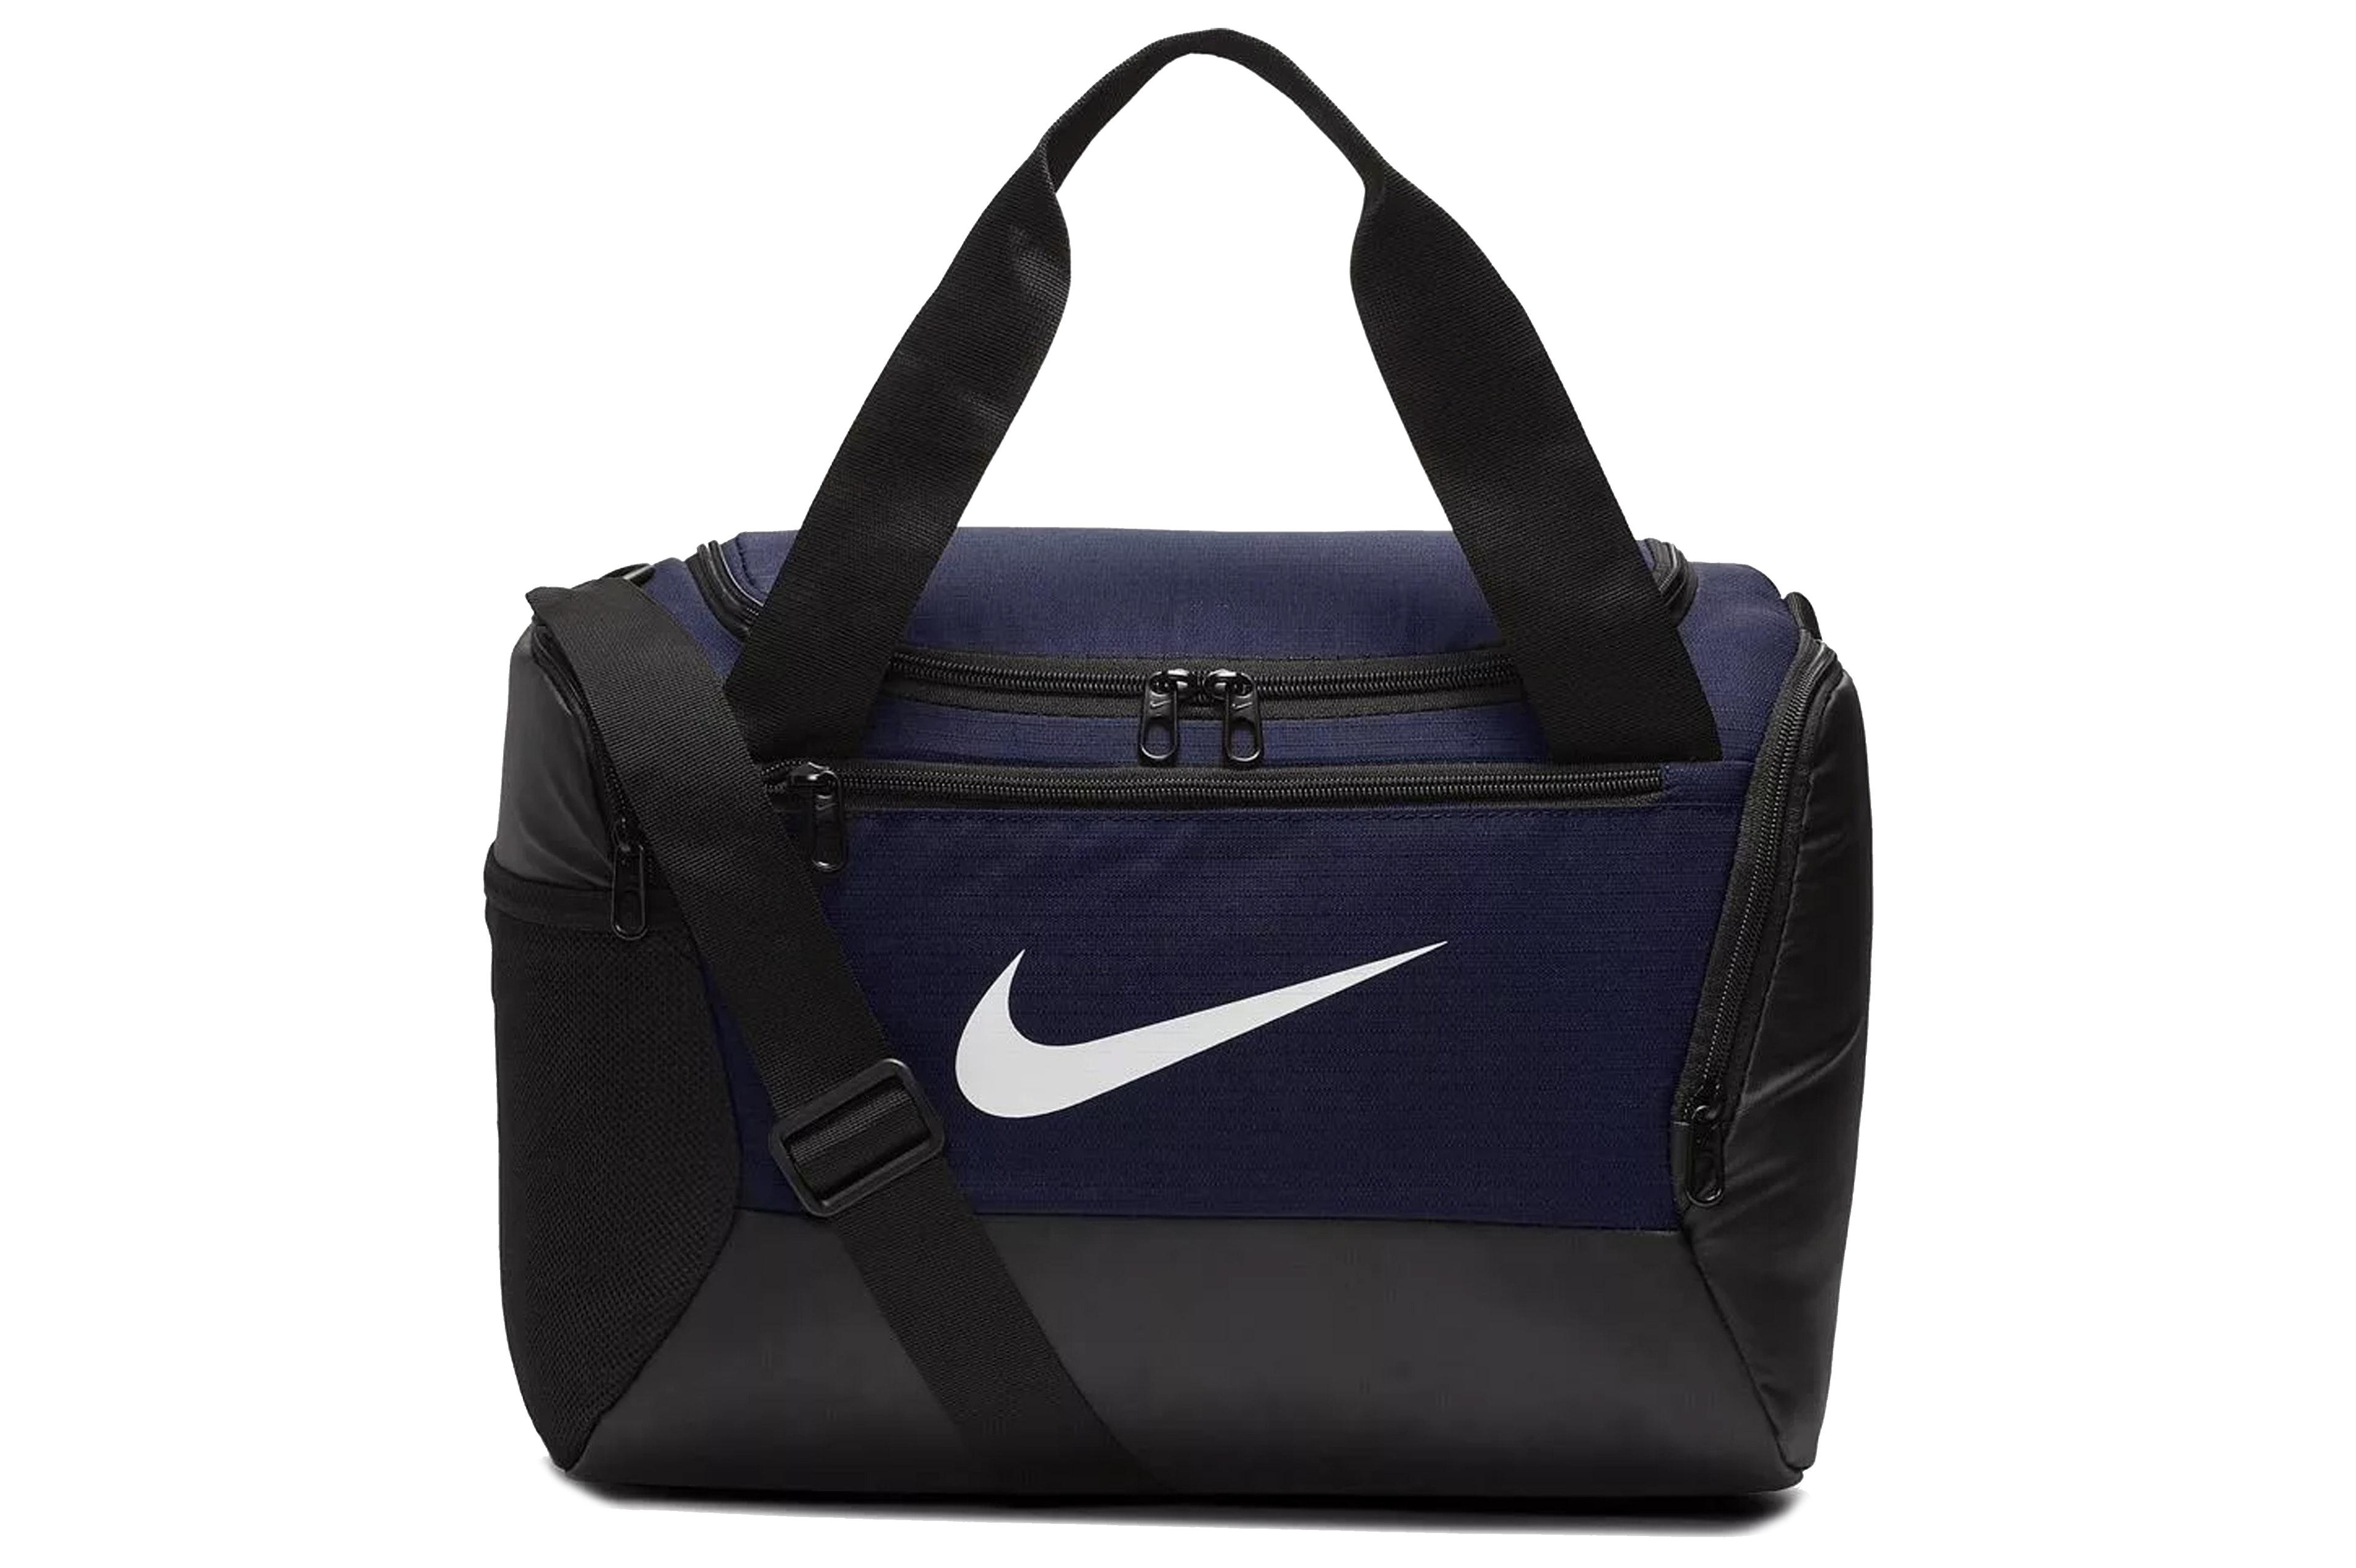 Nike NK BRSLA XS DUFF - 9.0 (25L) BA5961-410